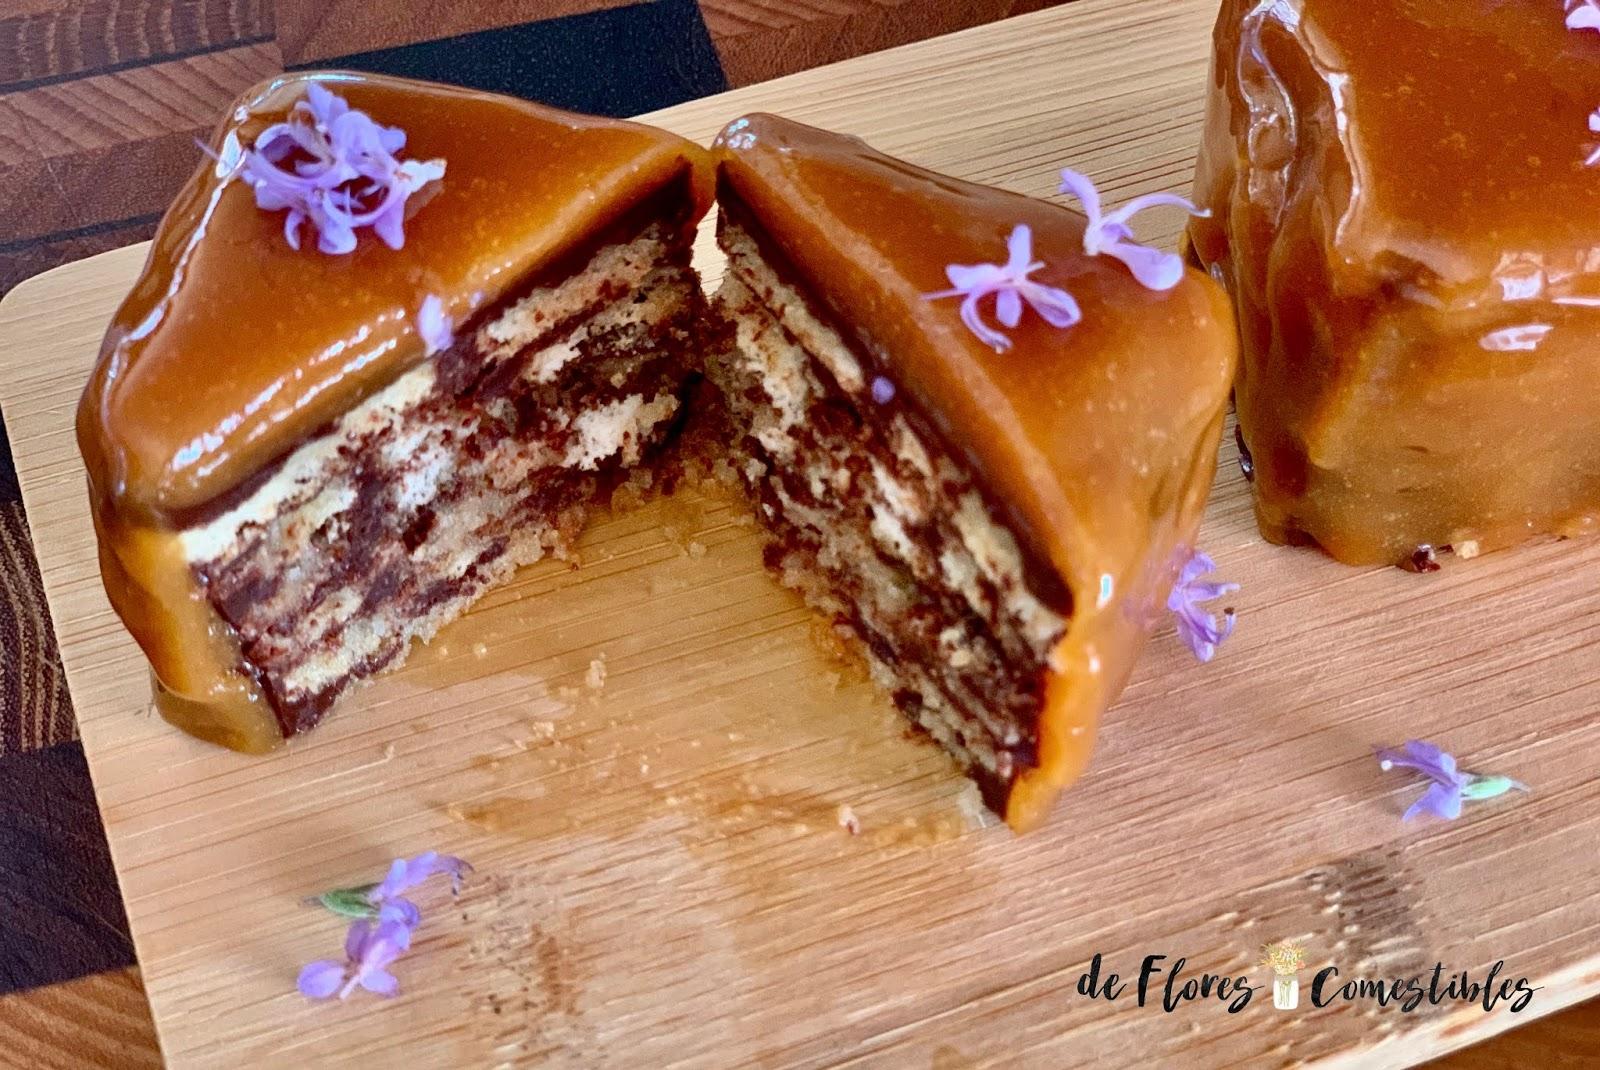 Petit four de chocolate y caramelo con romero